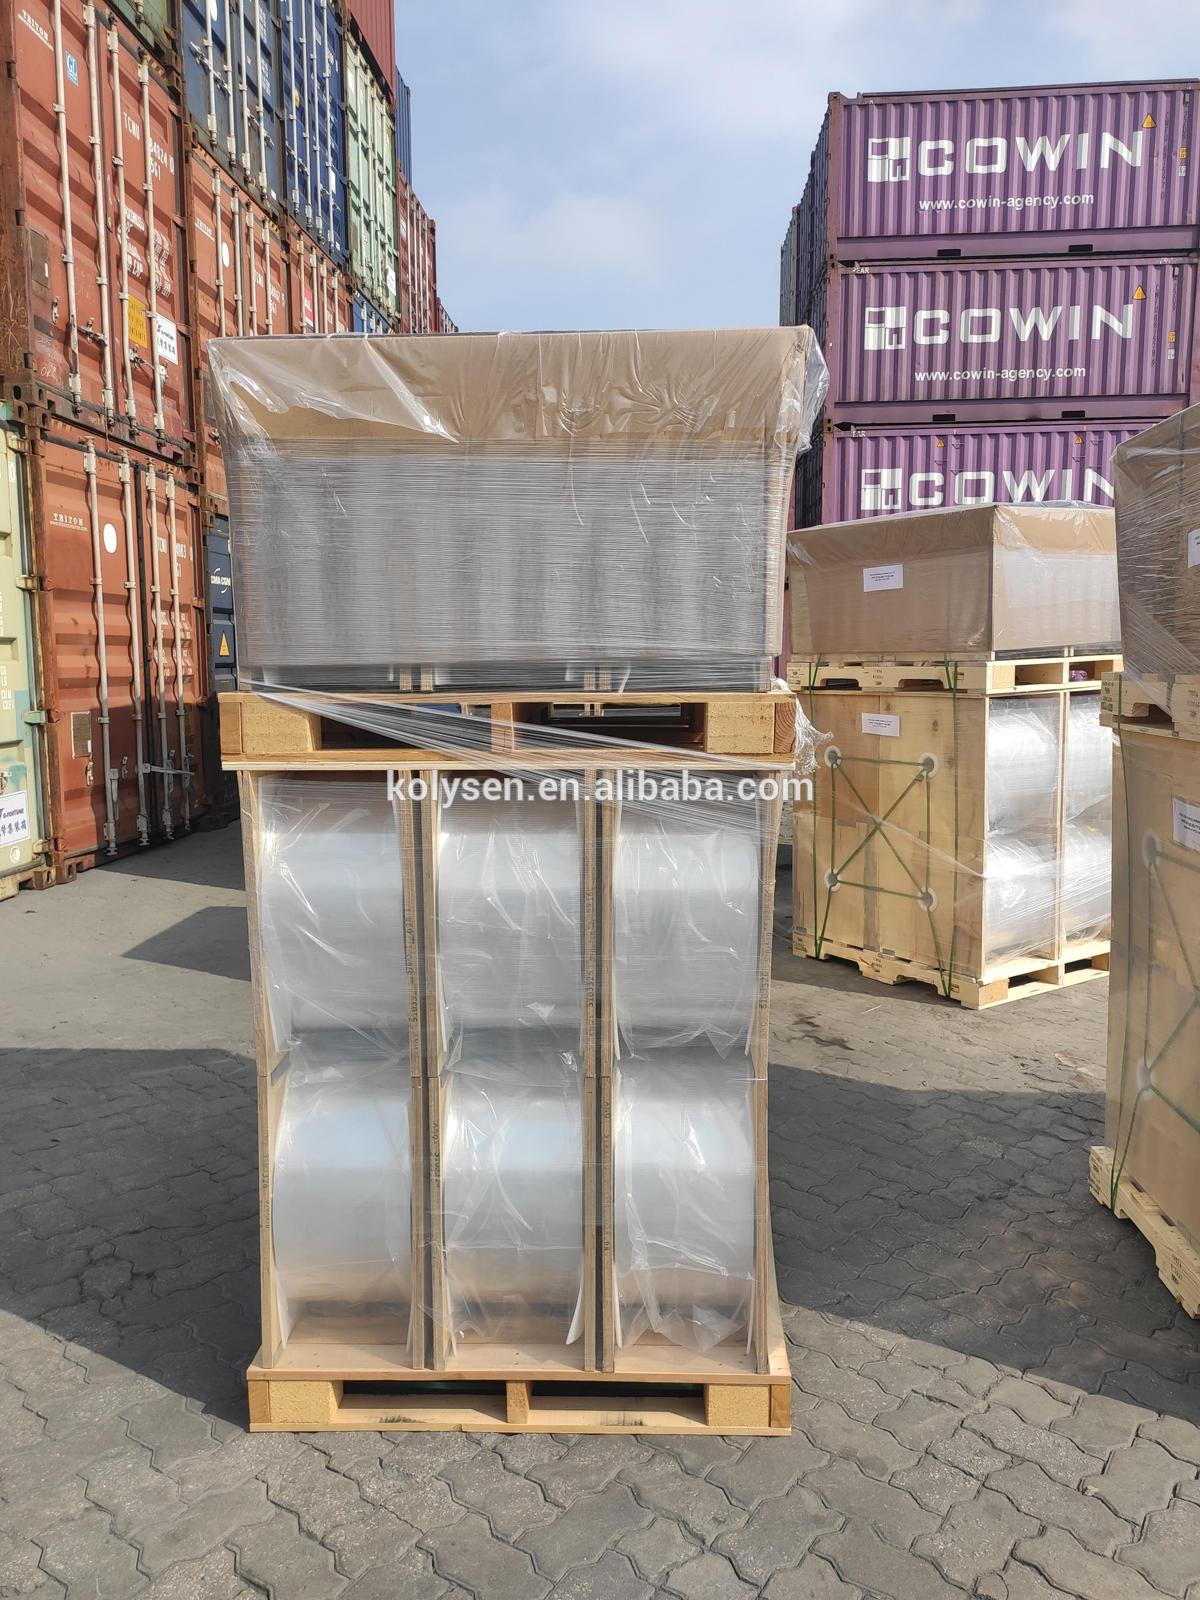 Factory Price High Quality Transparent PETG Shrink Film for Label Printing